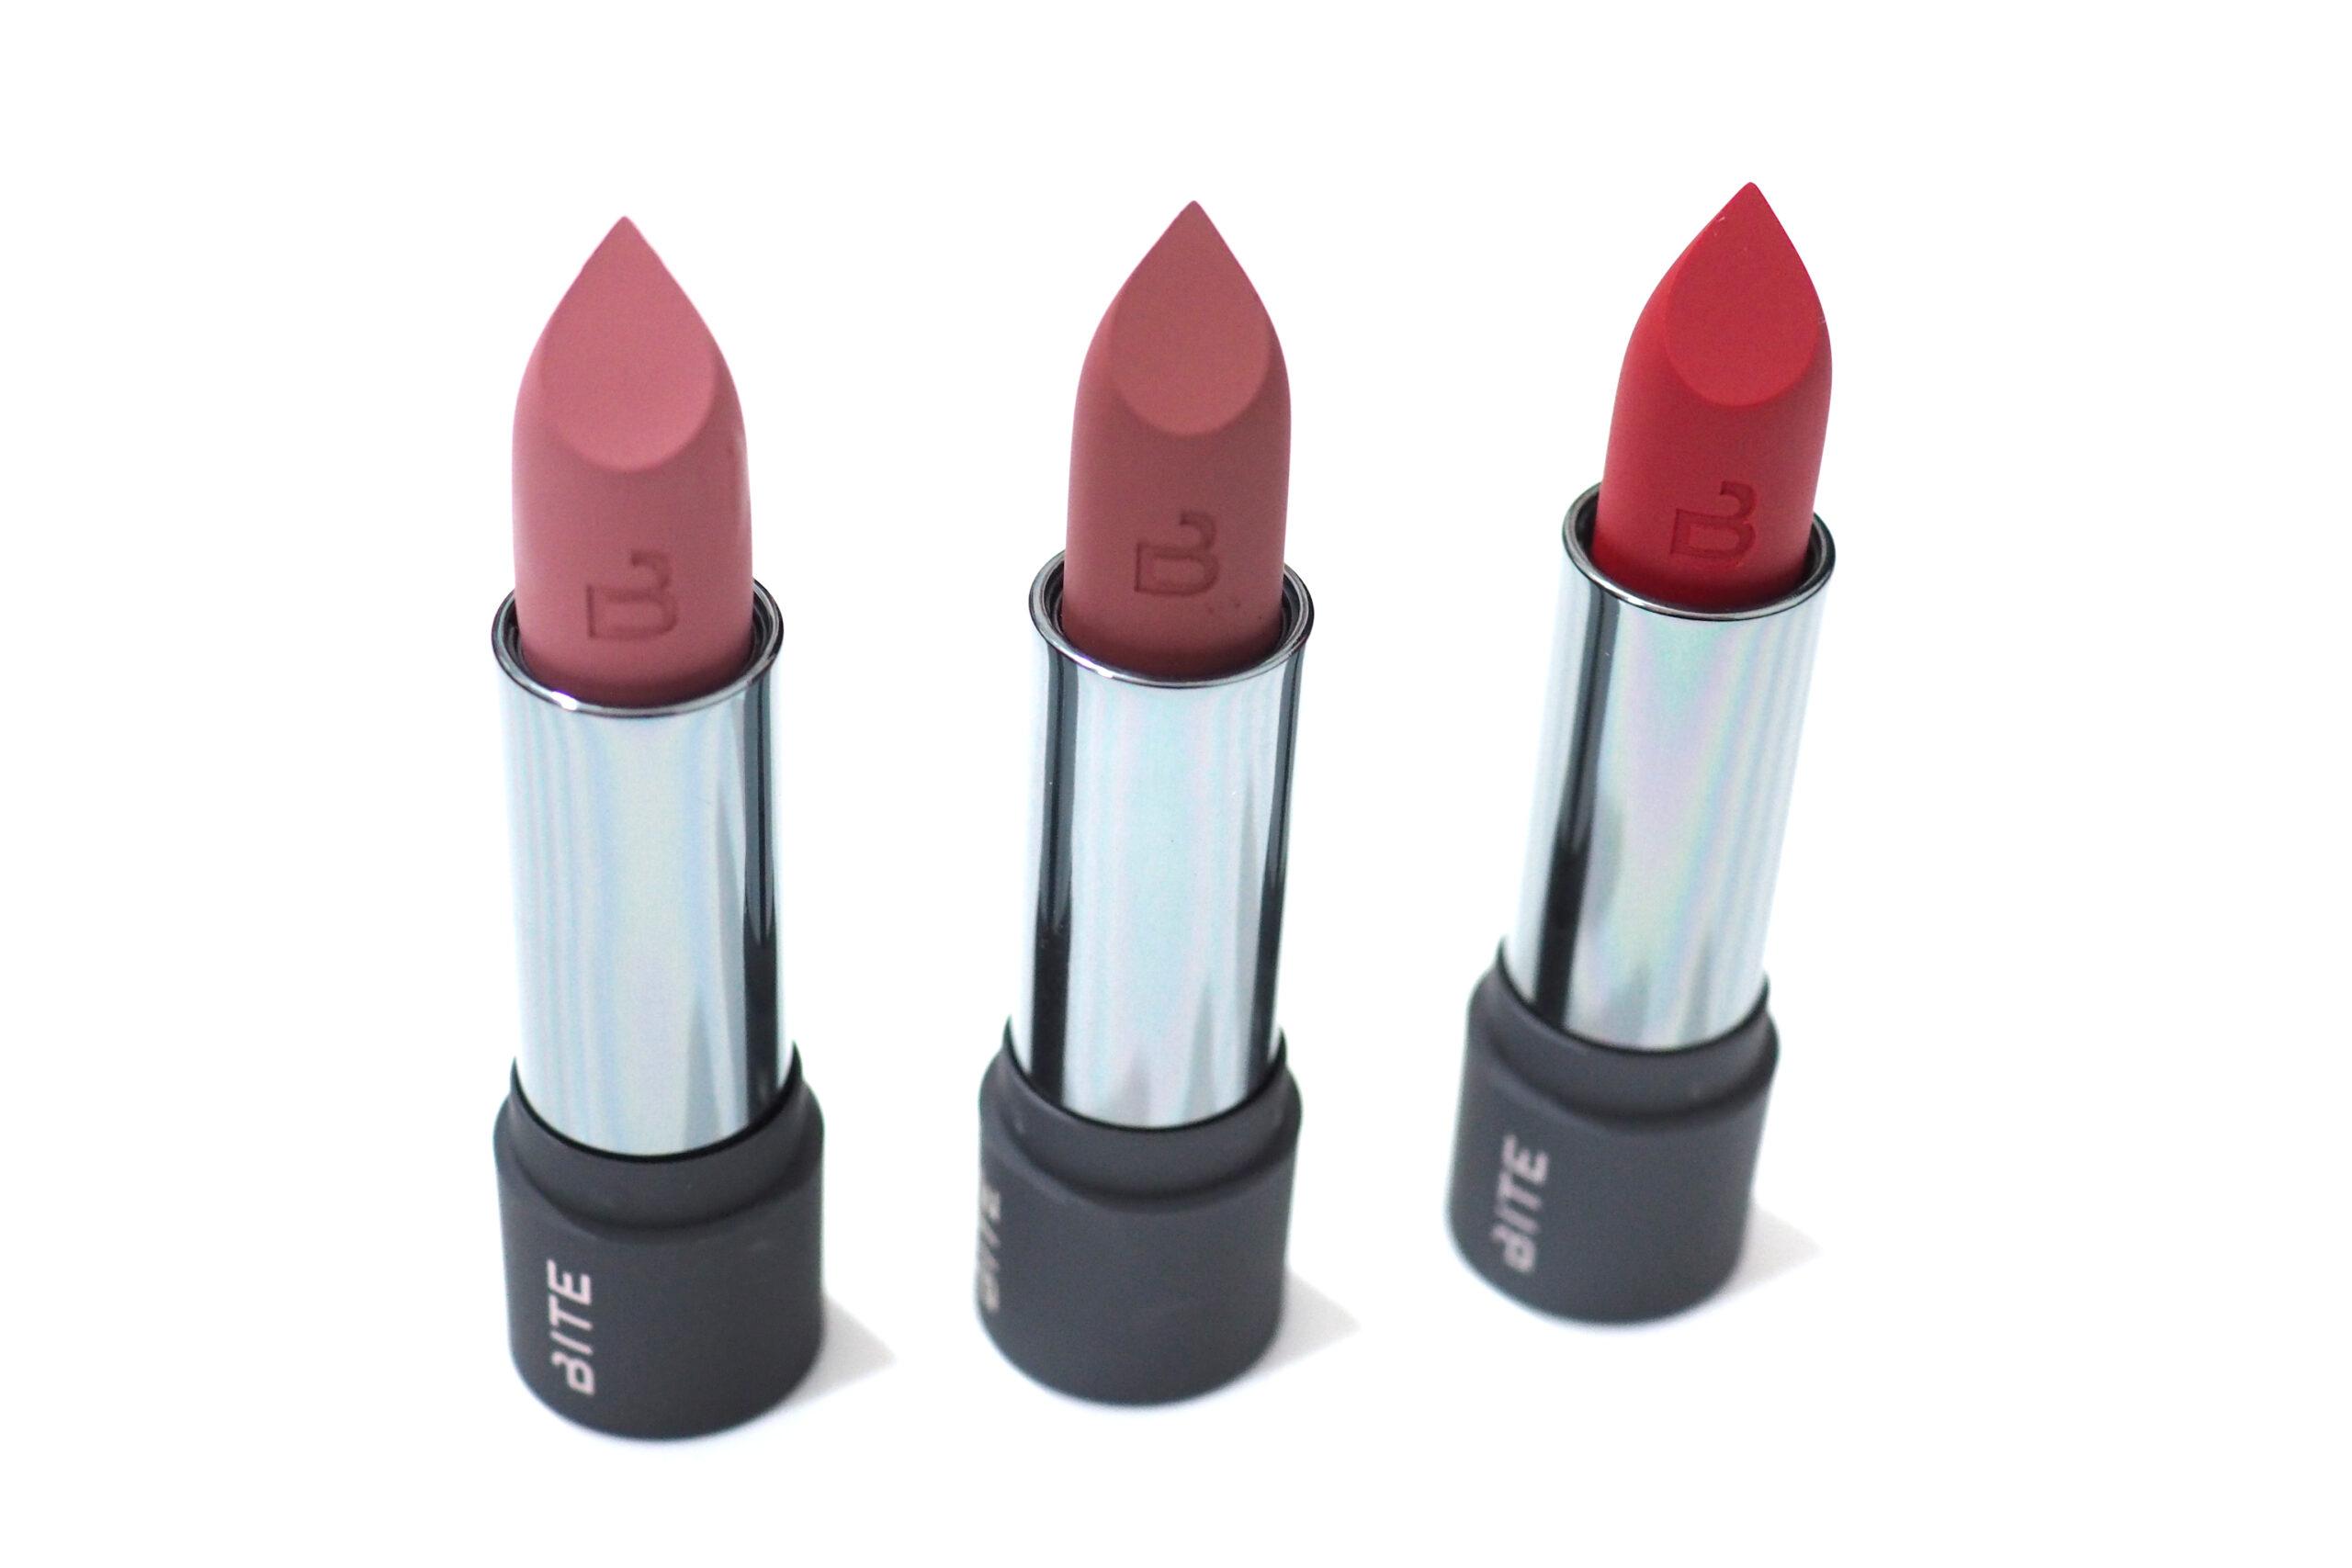 Bite Beauty Power Move Soft Matte Lipsticks Review / Swatches